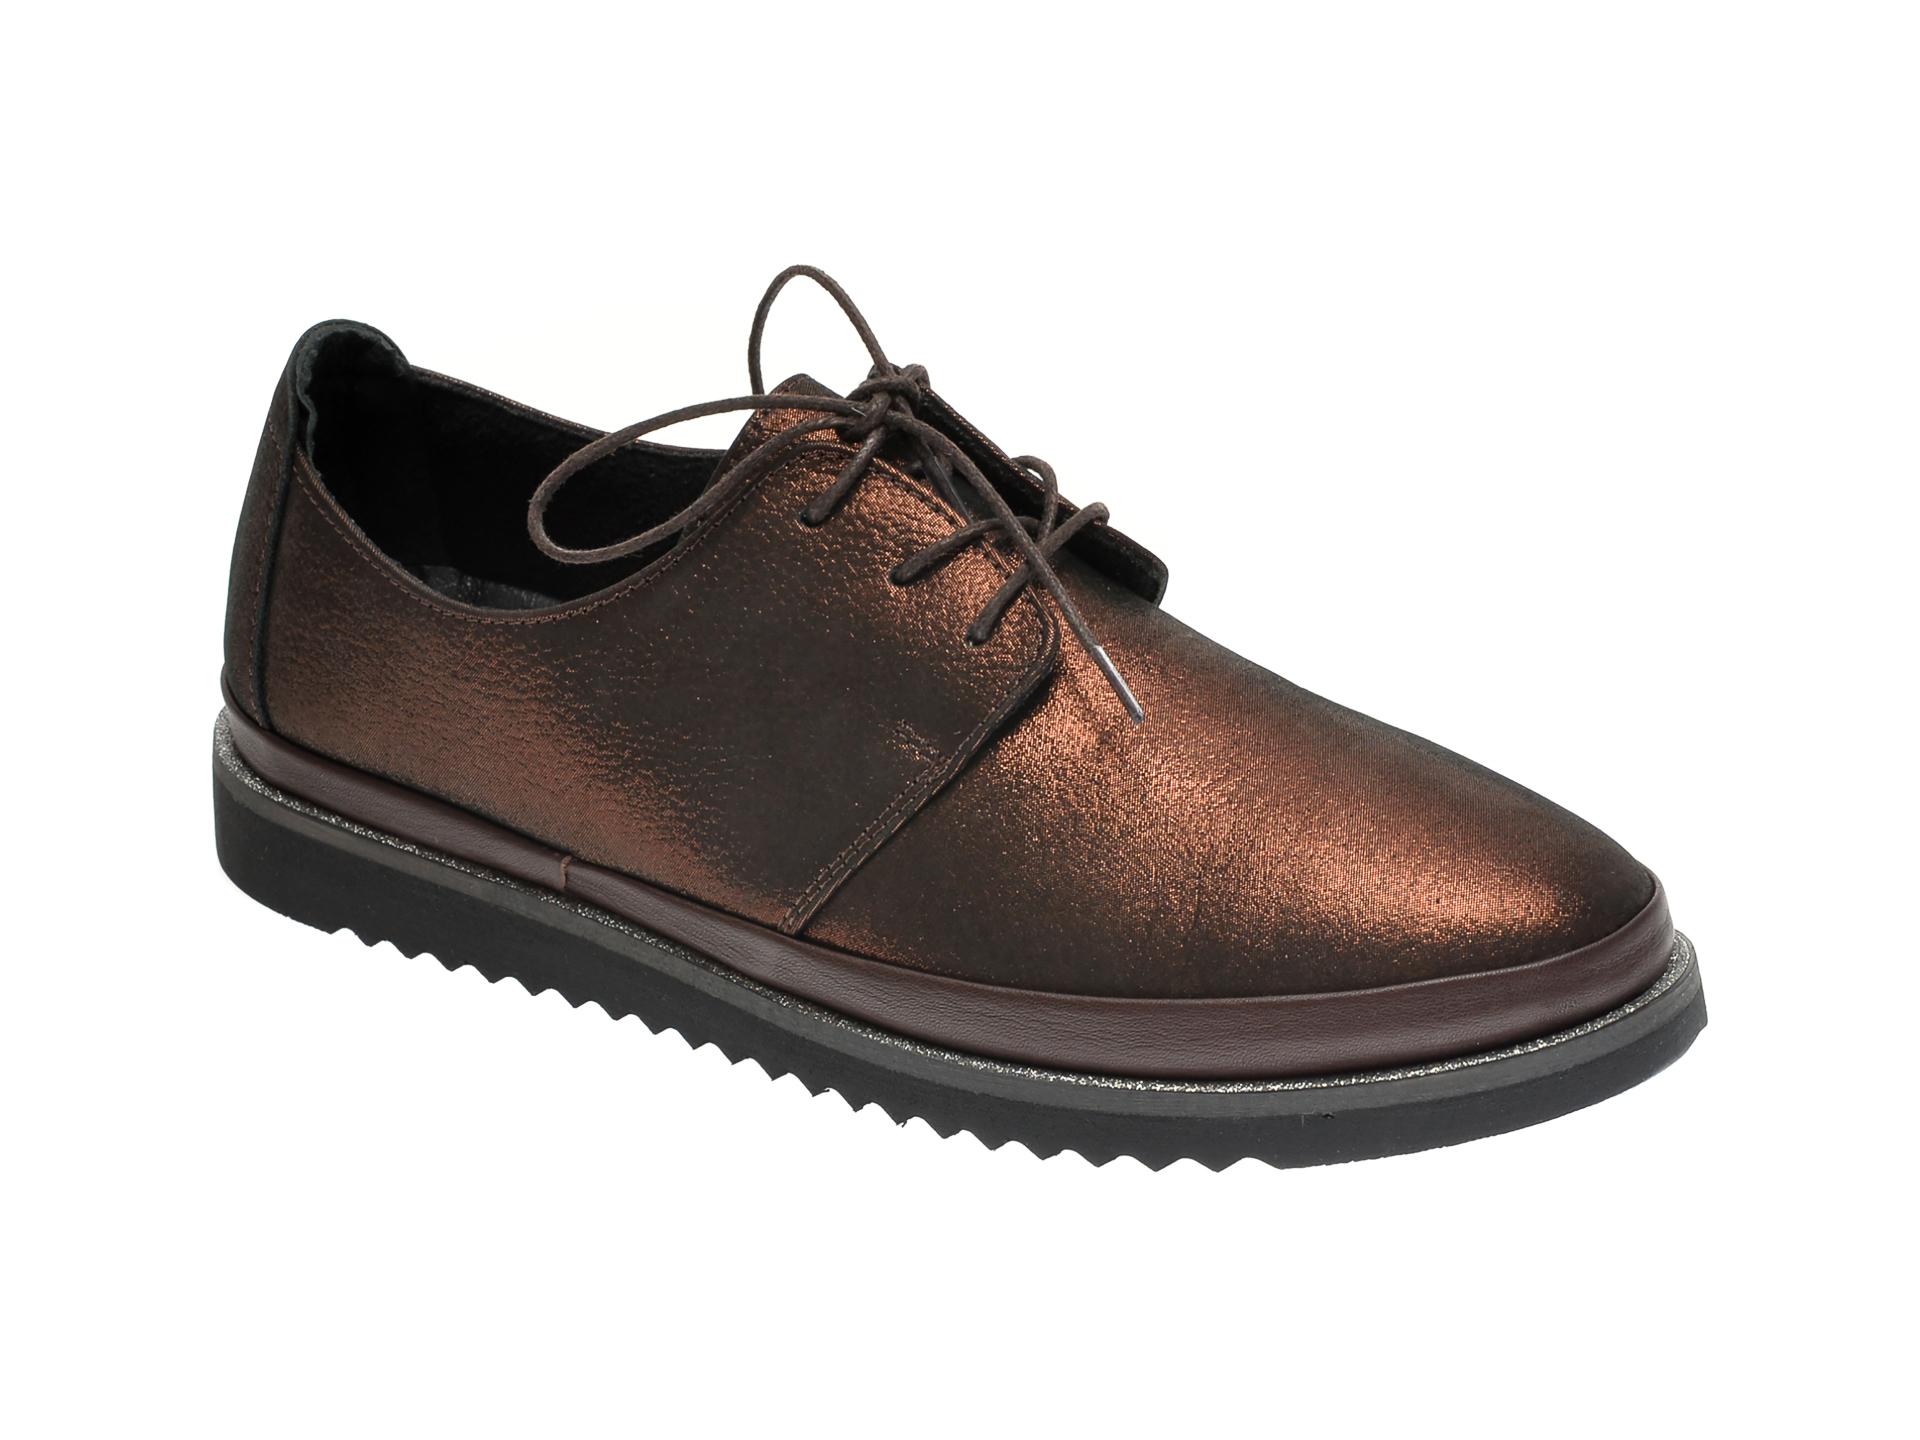 Pantofi ILOZ maro, 8009, din piele naturala imagine